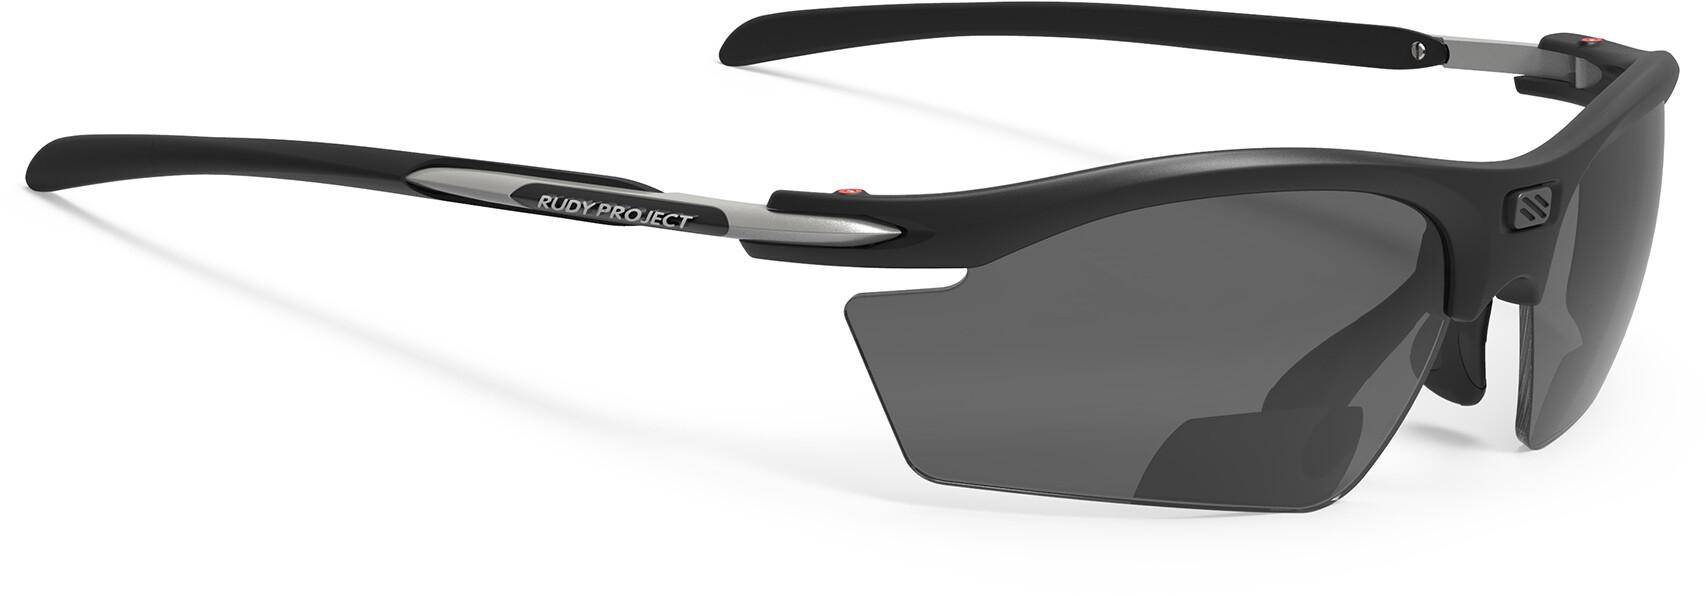 Rudy Project Rydon Readers +2.0 dpt Cykelbriller, matte black / smoke black | Briller